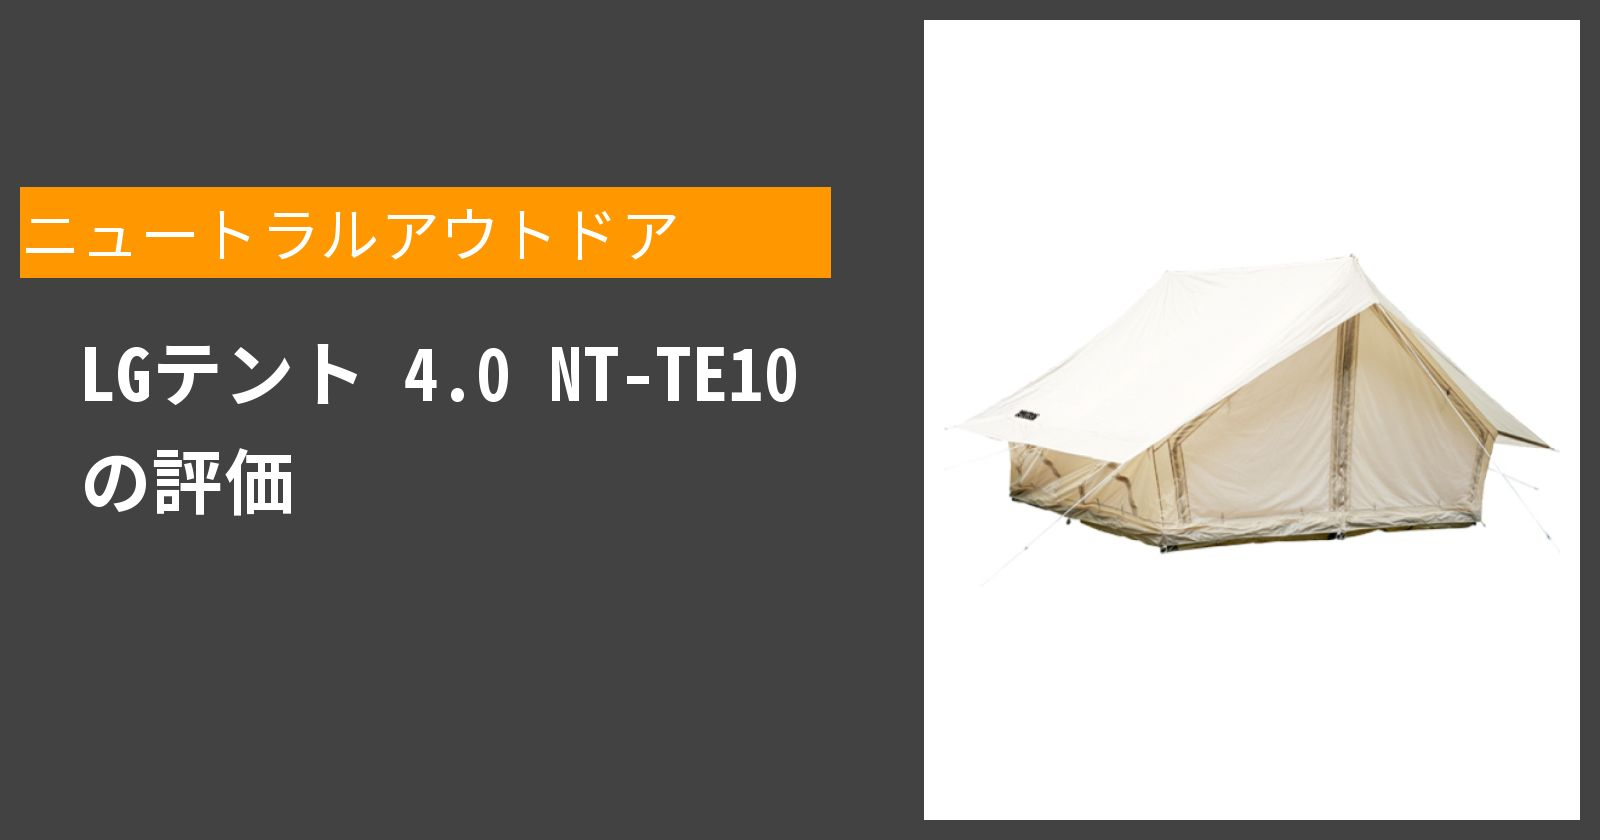 LGテント 4.0 NT-TE10を徹底評価